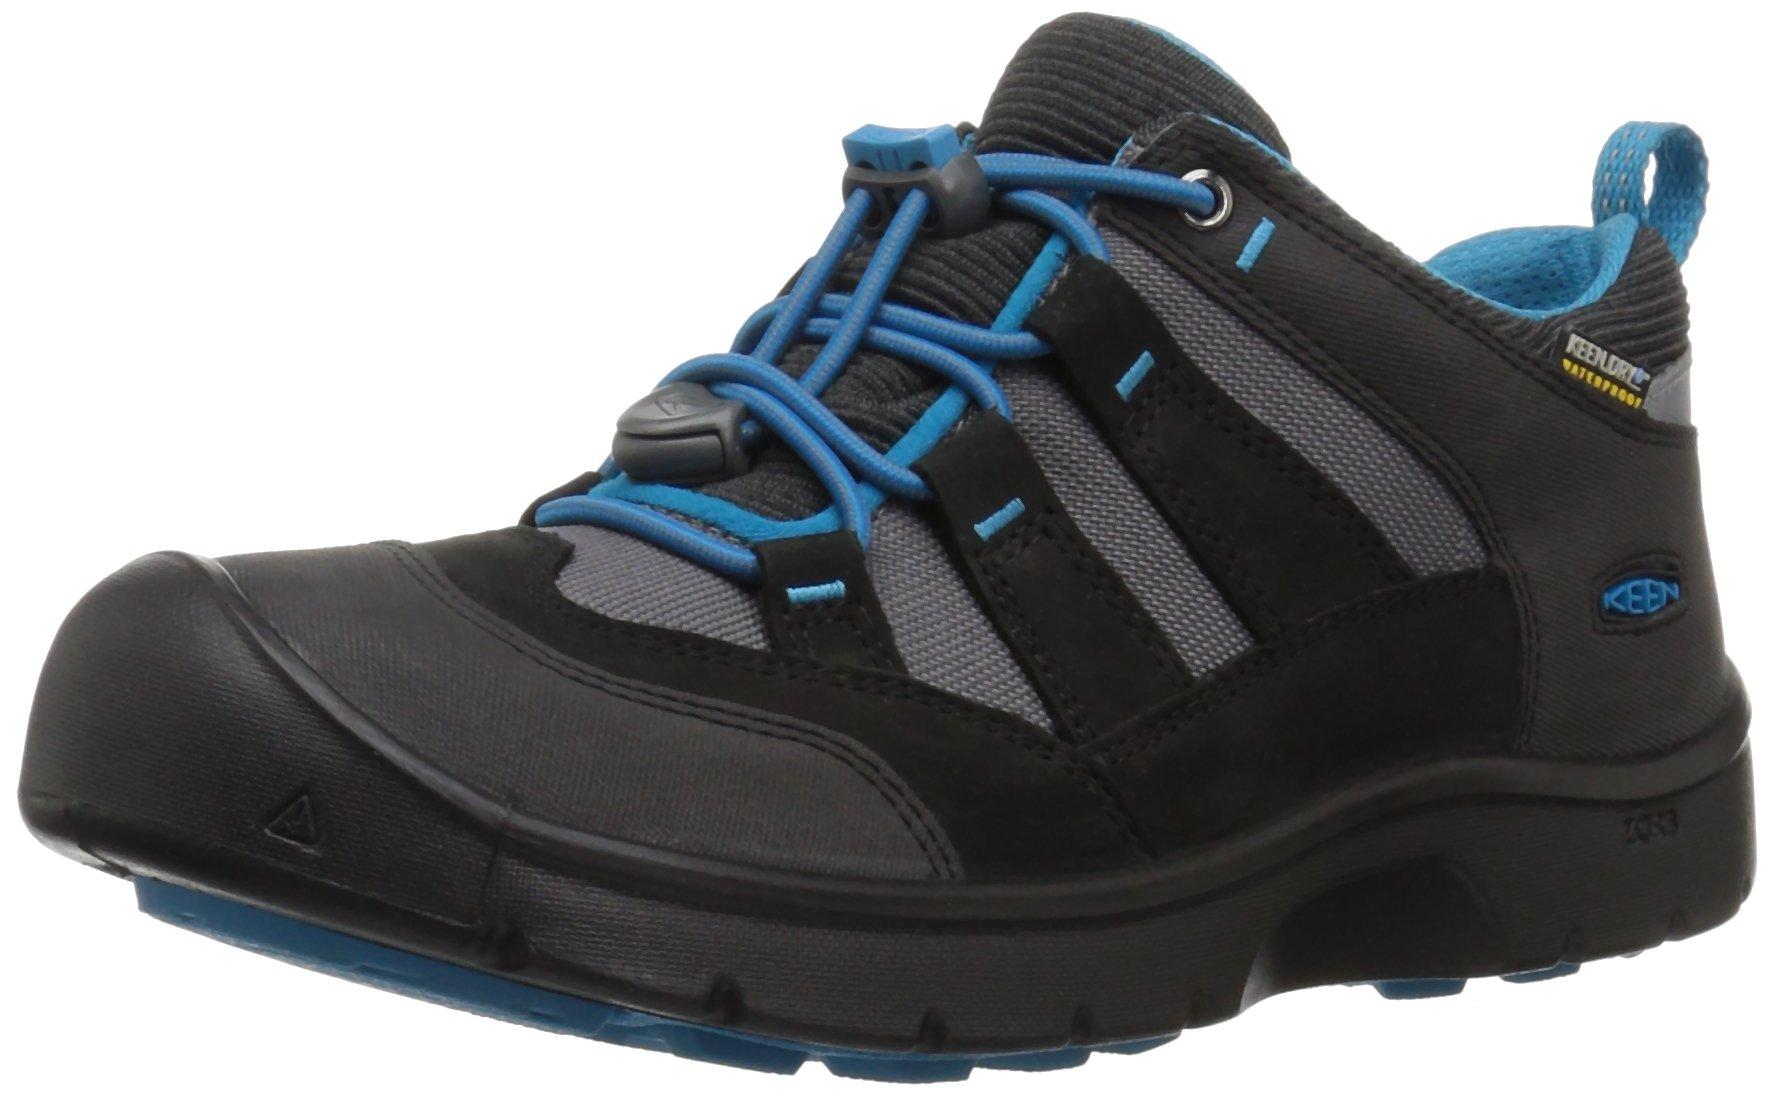 KEEN Kids' Hikeport WP Hiking Shoe,Black/Blue Jewel,3 Youth US Big Kid